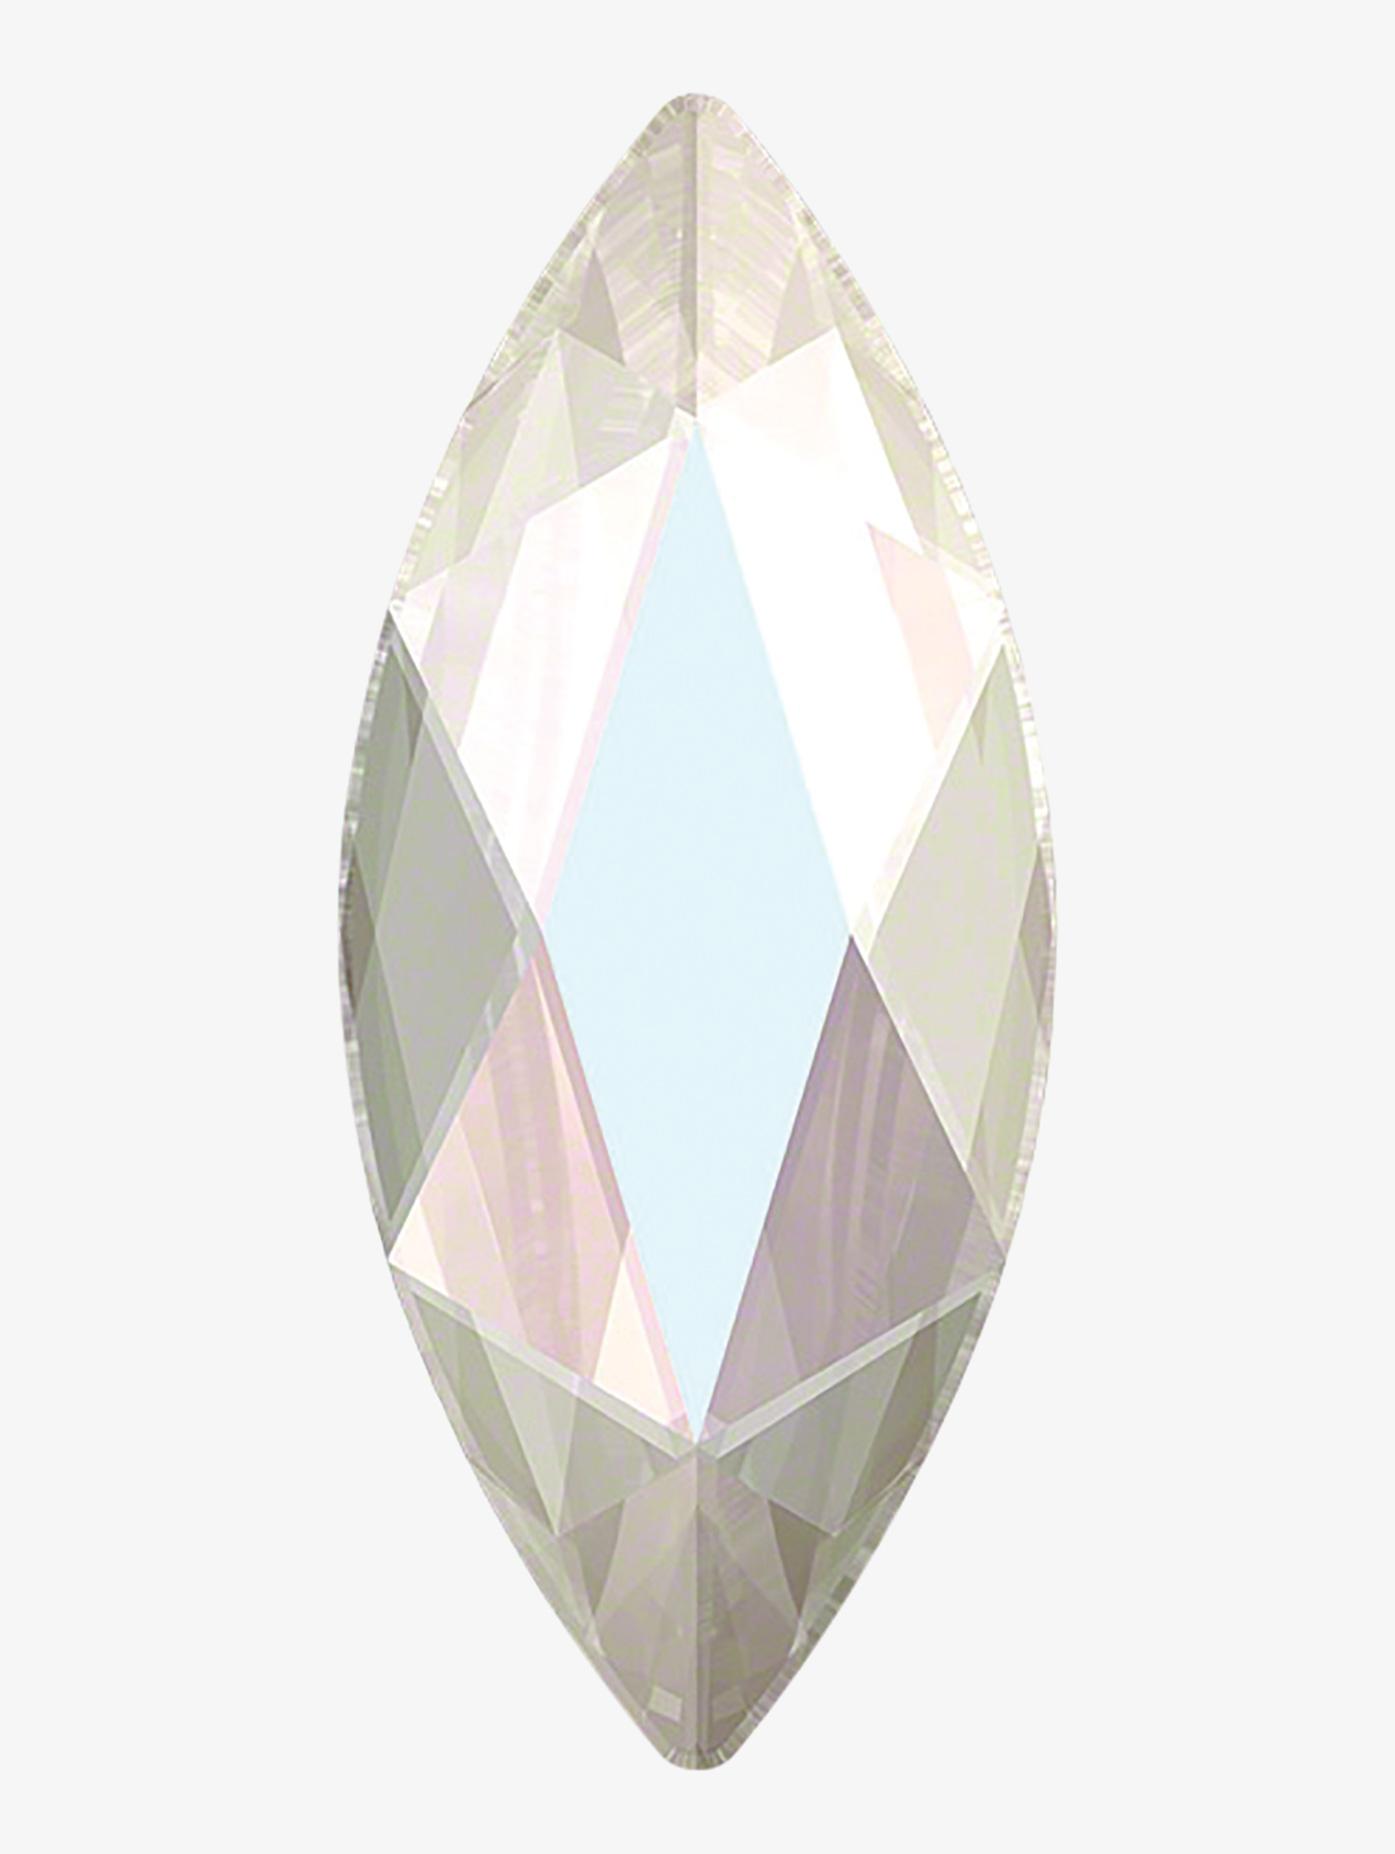 Rhinestones Unlimited Swarovski Crystal AB Marquise Jewel Cut Flatback RU068